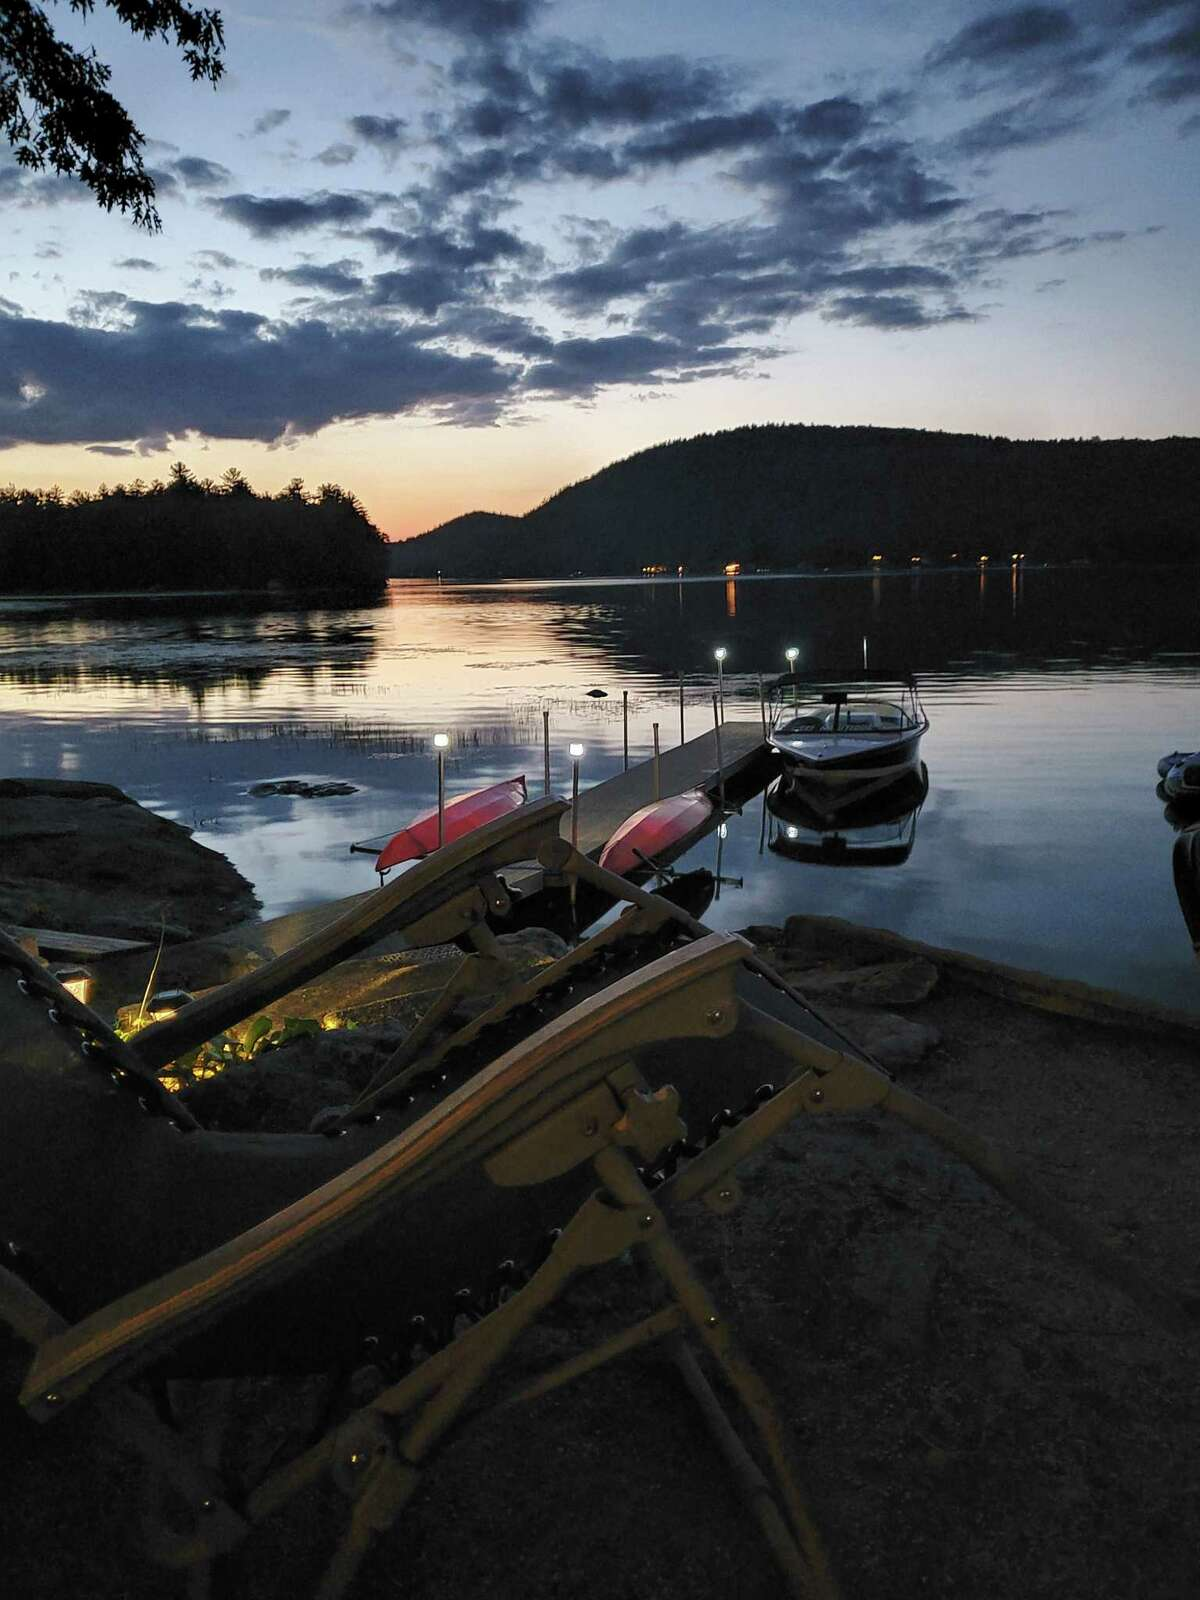 Dan Lynch of Latham shares a sunset at Lake Massacecum, New Hampshire.